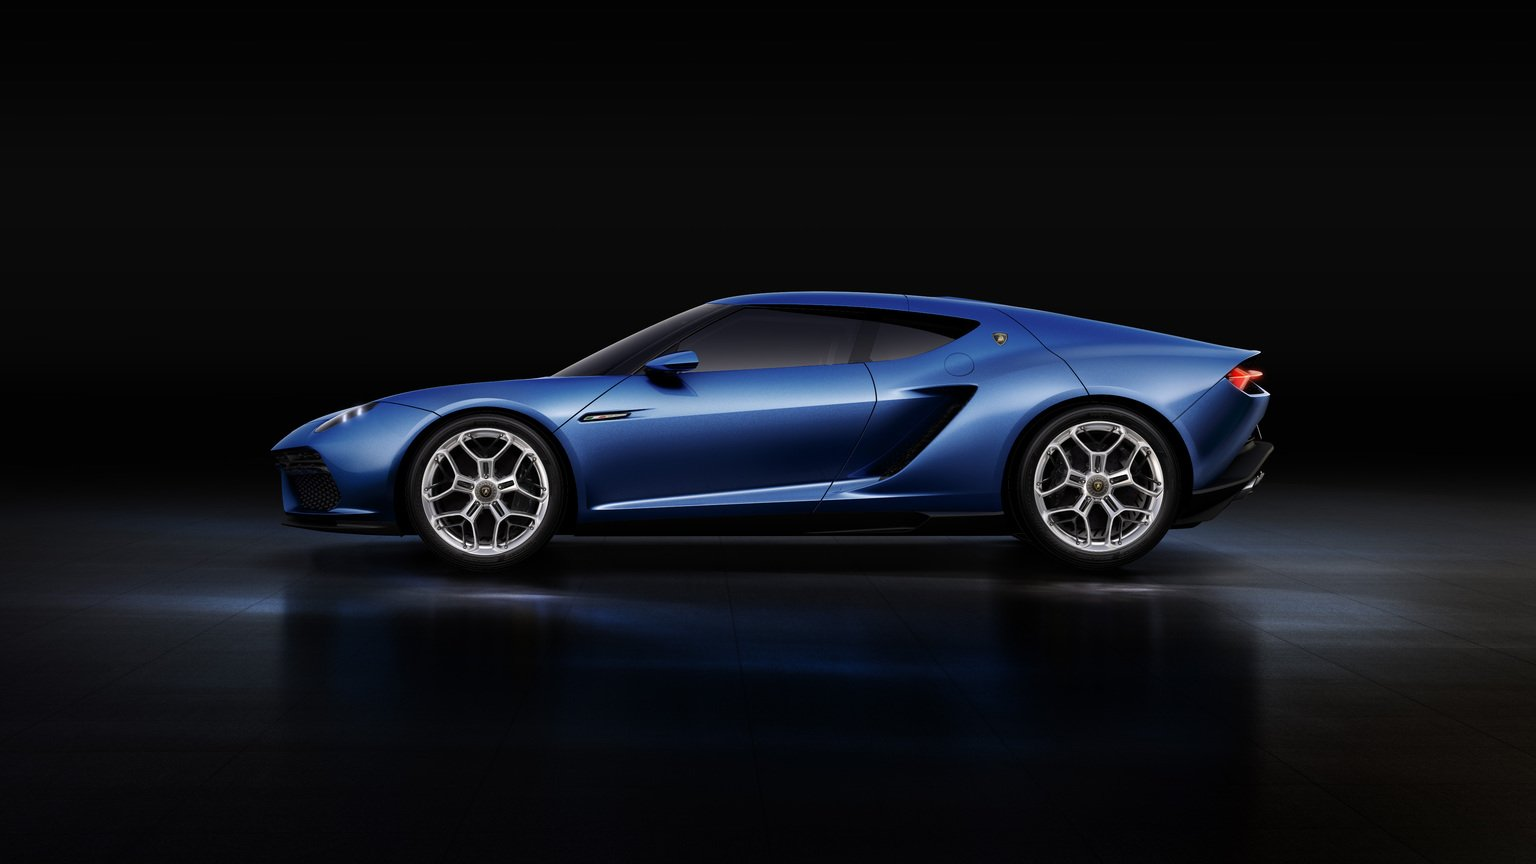 Side view of Lamborghini Asterion